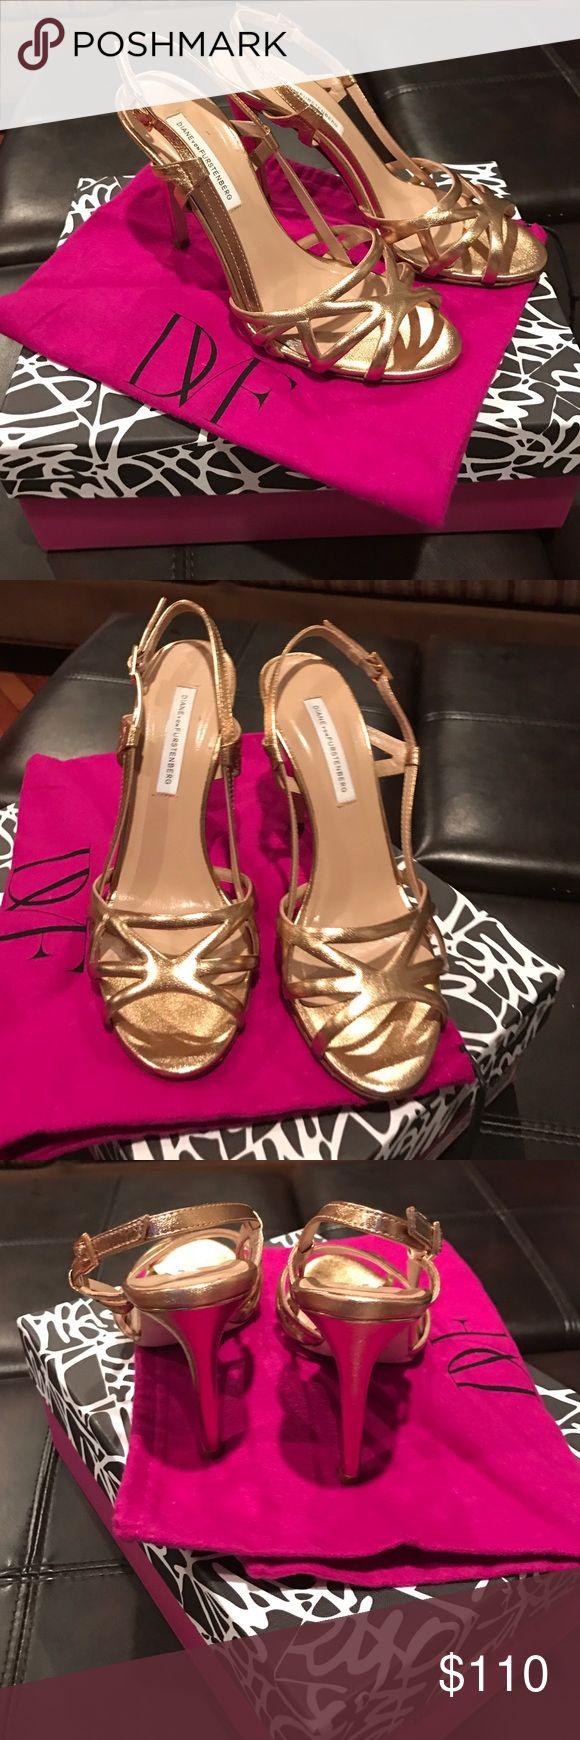 Diane von Furstenberg gold evening shoe. Gold strappy evening shoe.  Dust bag included. Worn once. Mint condition. Diane von Furstenberg Shoes Heels